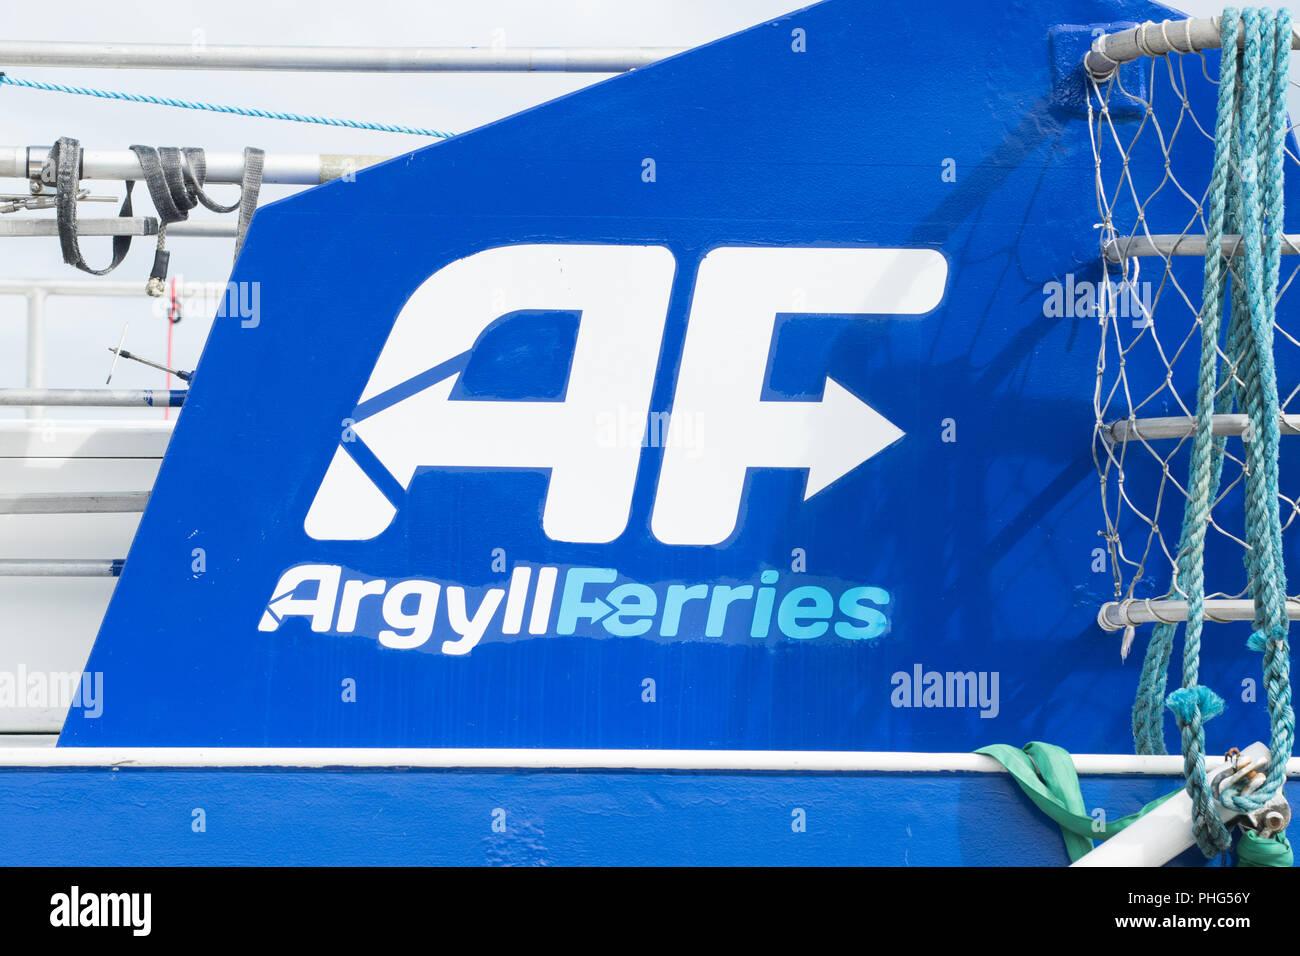 Argyll Ferries logo, Gourock, Scotland, UK - Stock Image